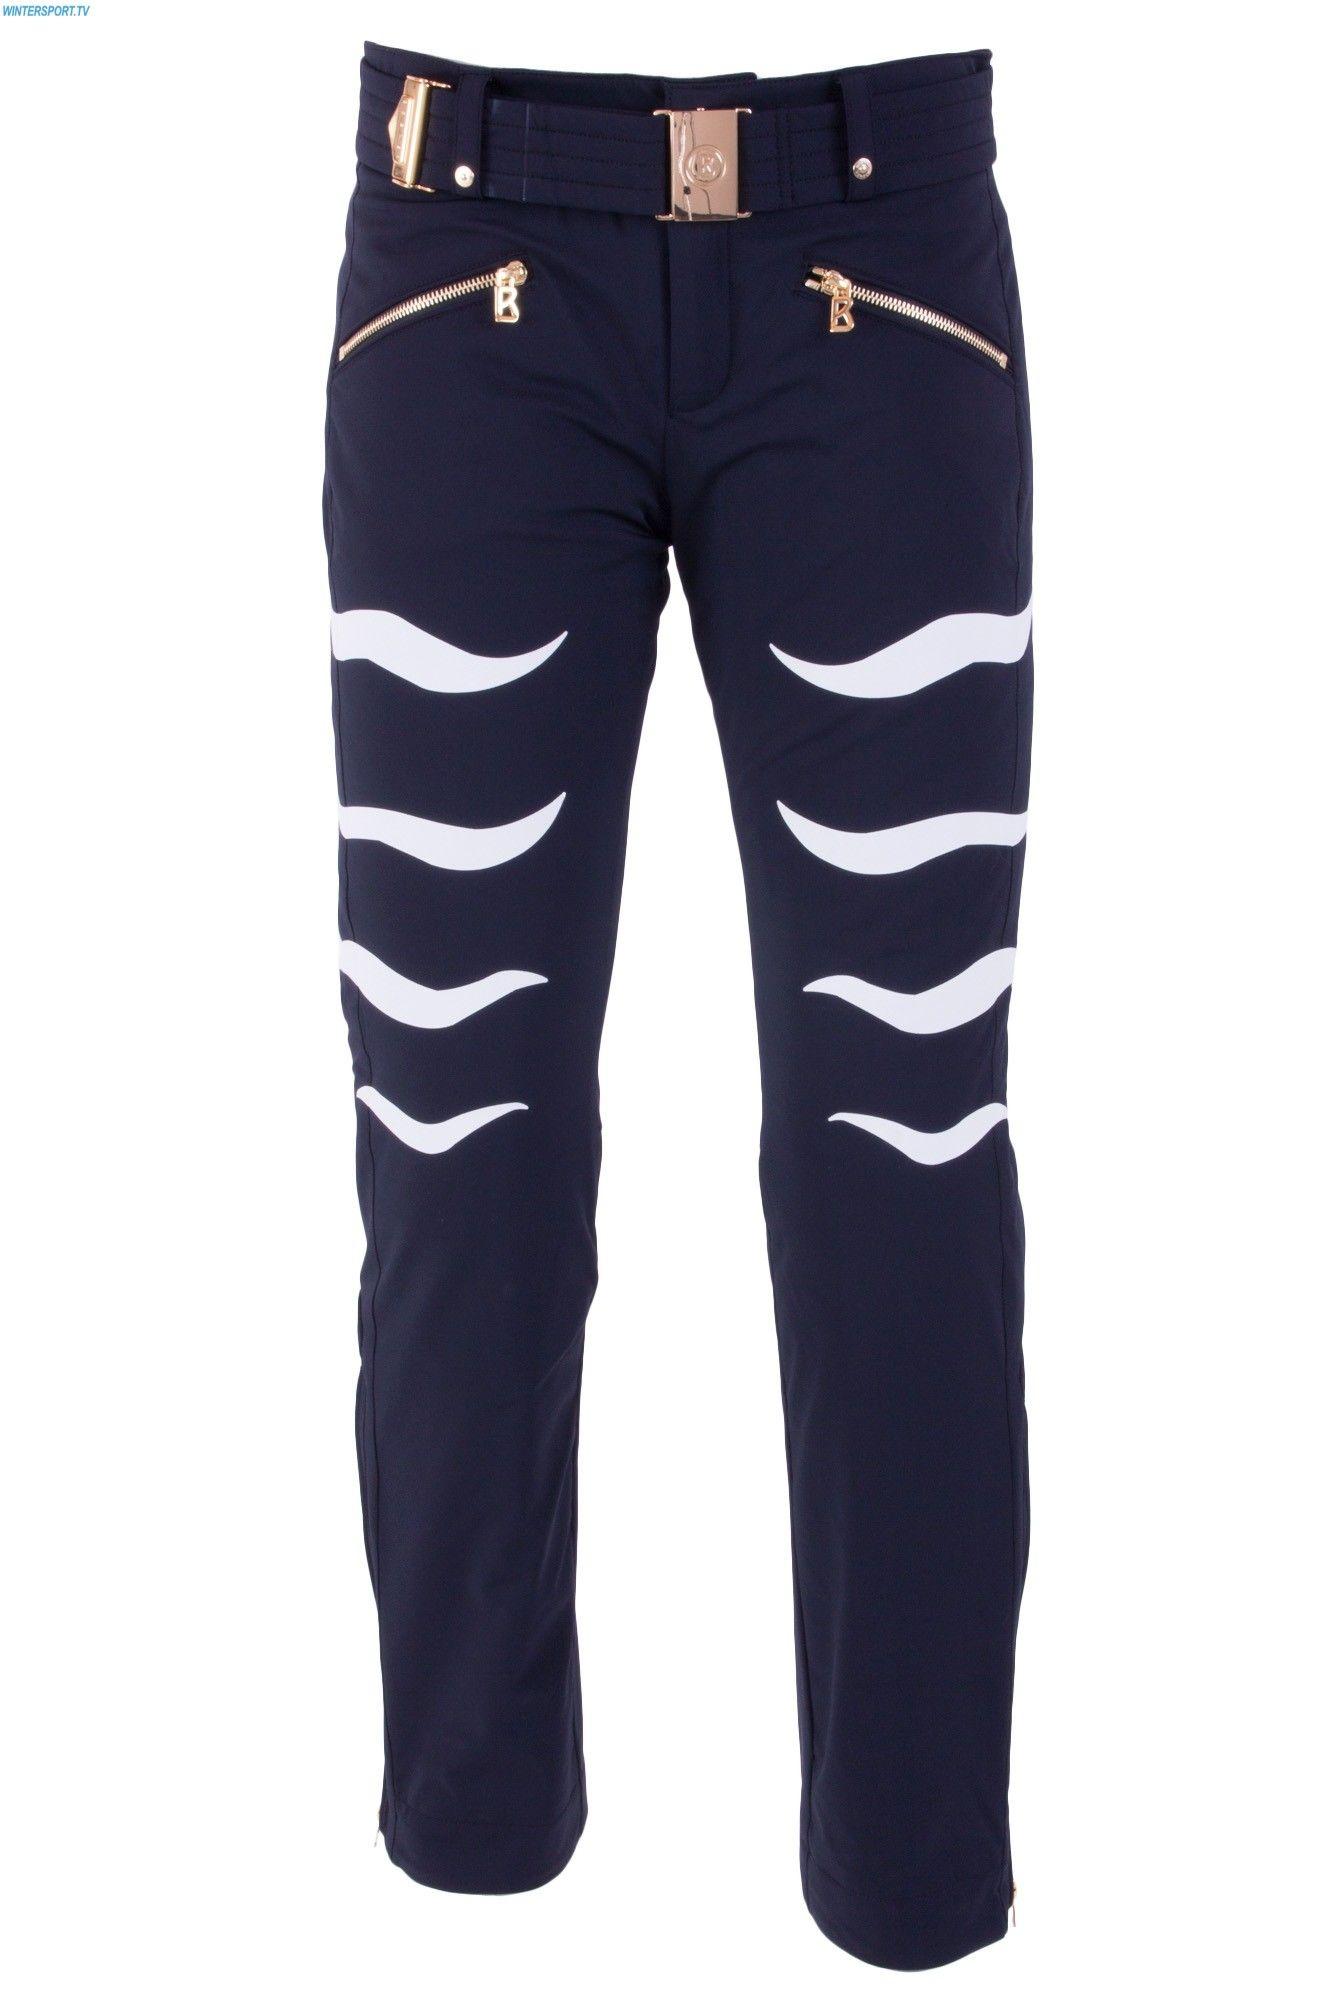 womens fitted ski pants black